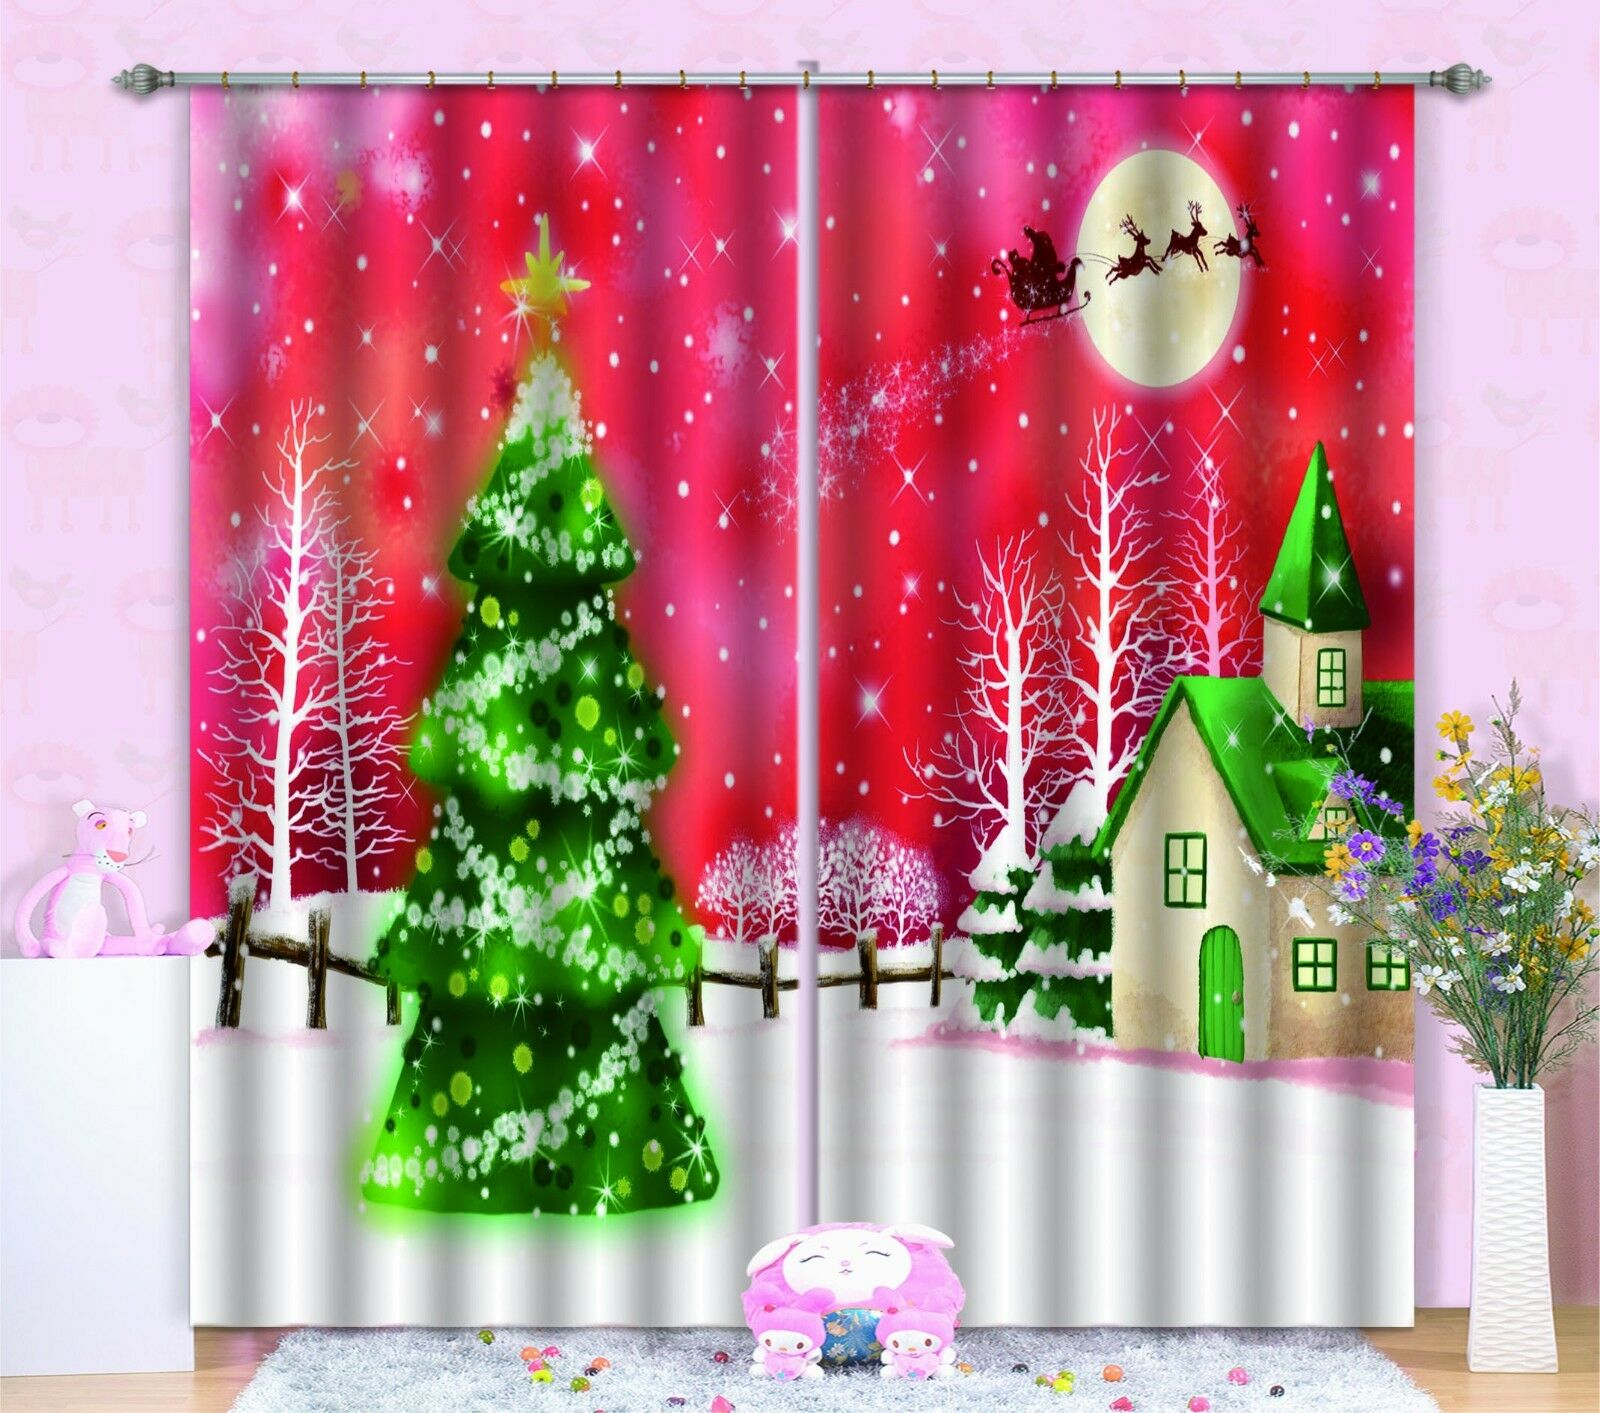 Vista de nieve 3D 977 Cortinas de impresión de cortina de foto Blockout Tela Cortinas Ventana CA